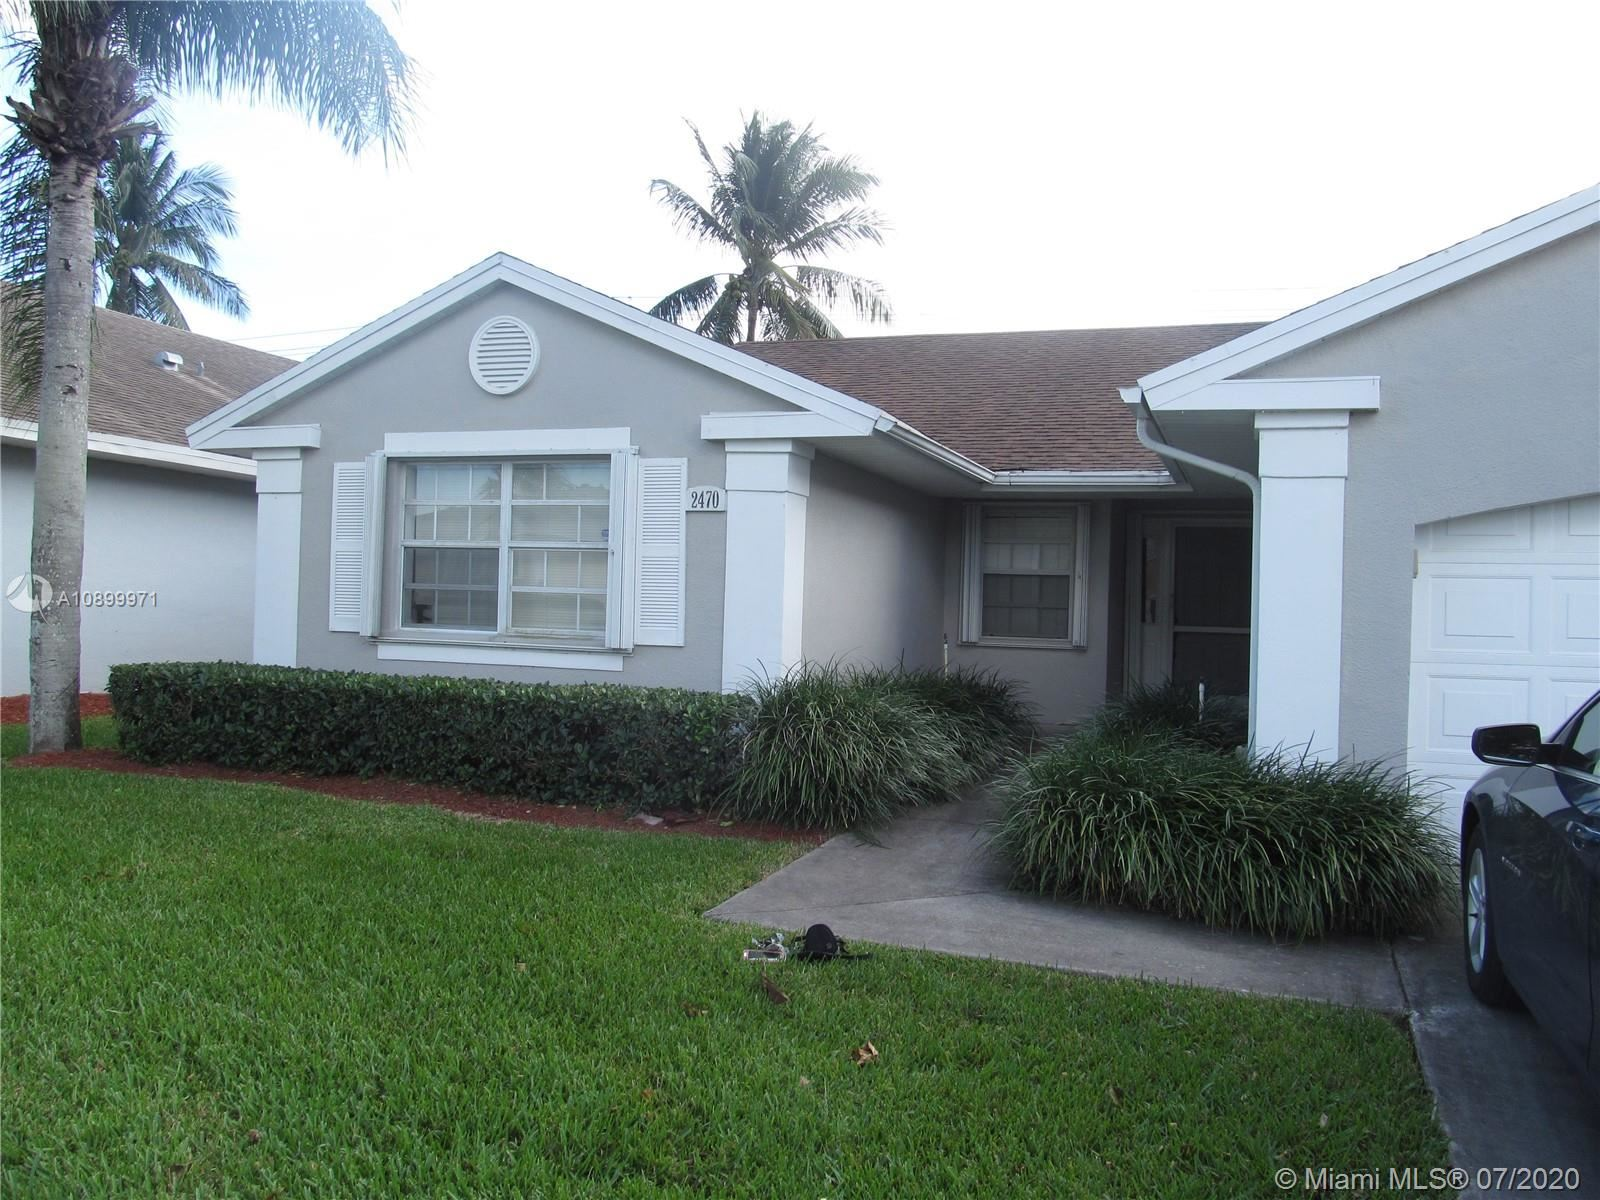 2470 SE 7th Place, Homestead, FL 33033 - #: A10899971